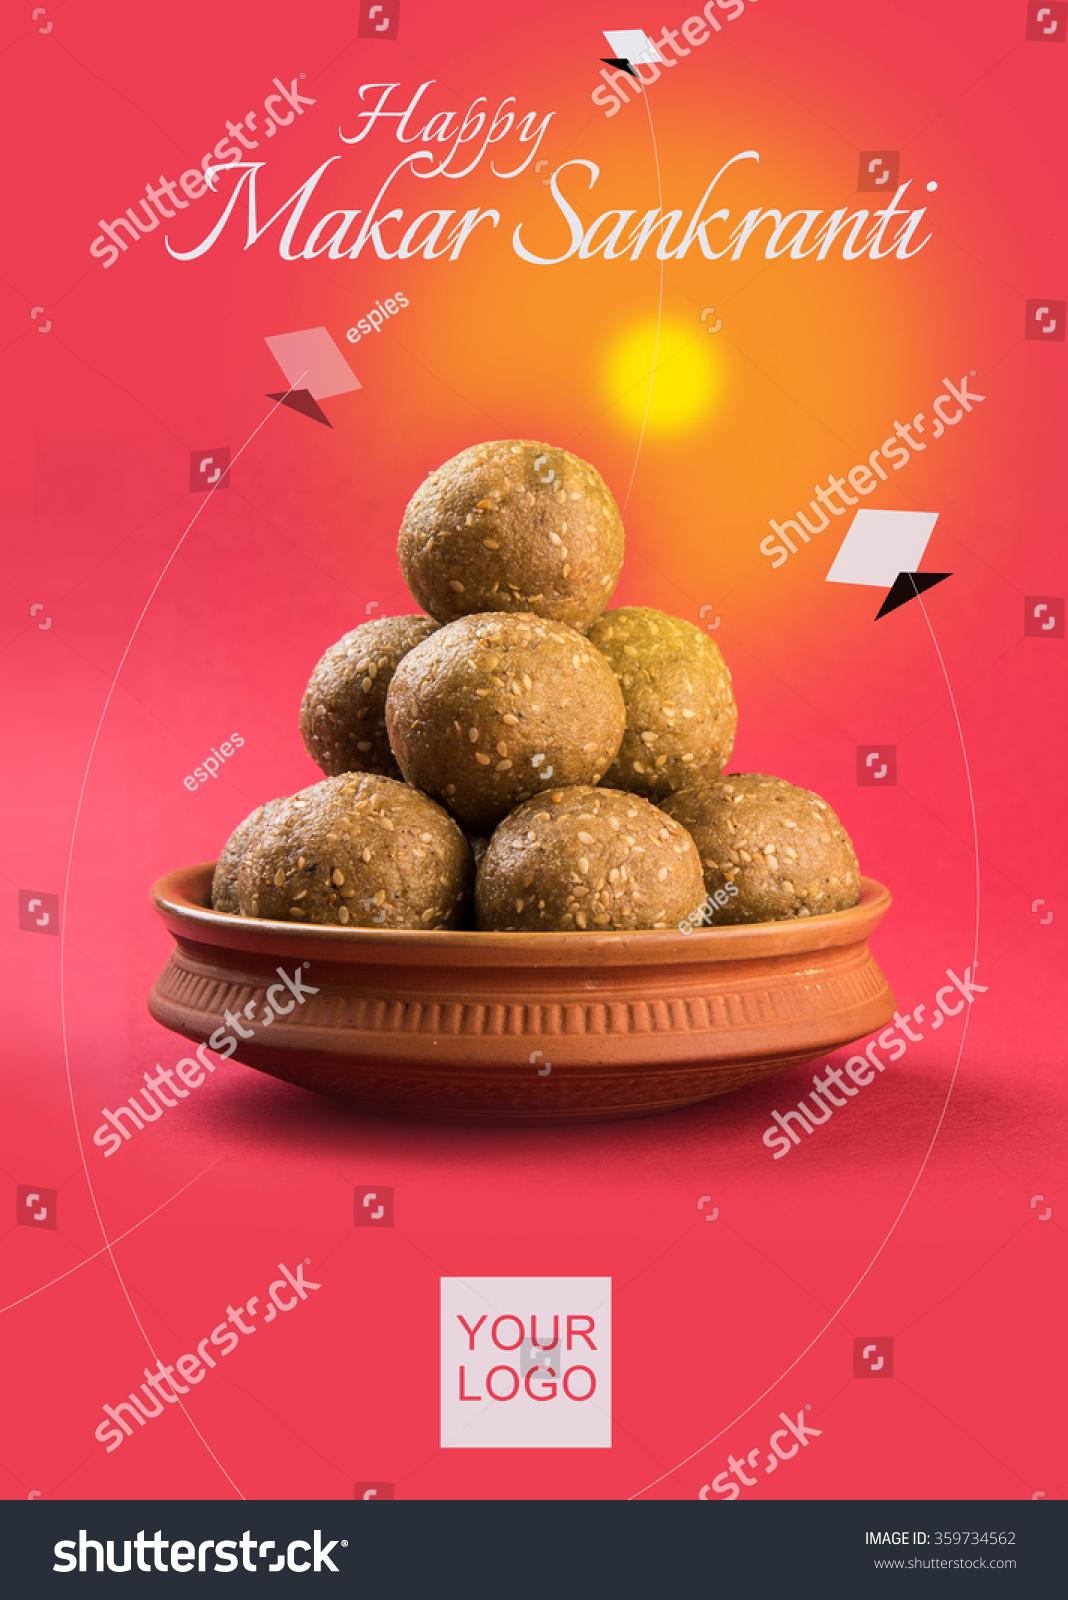 Happy makar sankranti greeting card using stock photo edit now happy makar sankranti greeting card using sweet sesame or tilgul laddu in a bowl with huldi m4hsunfo